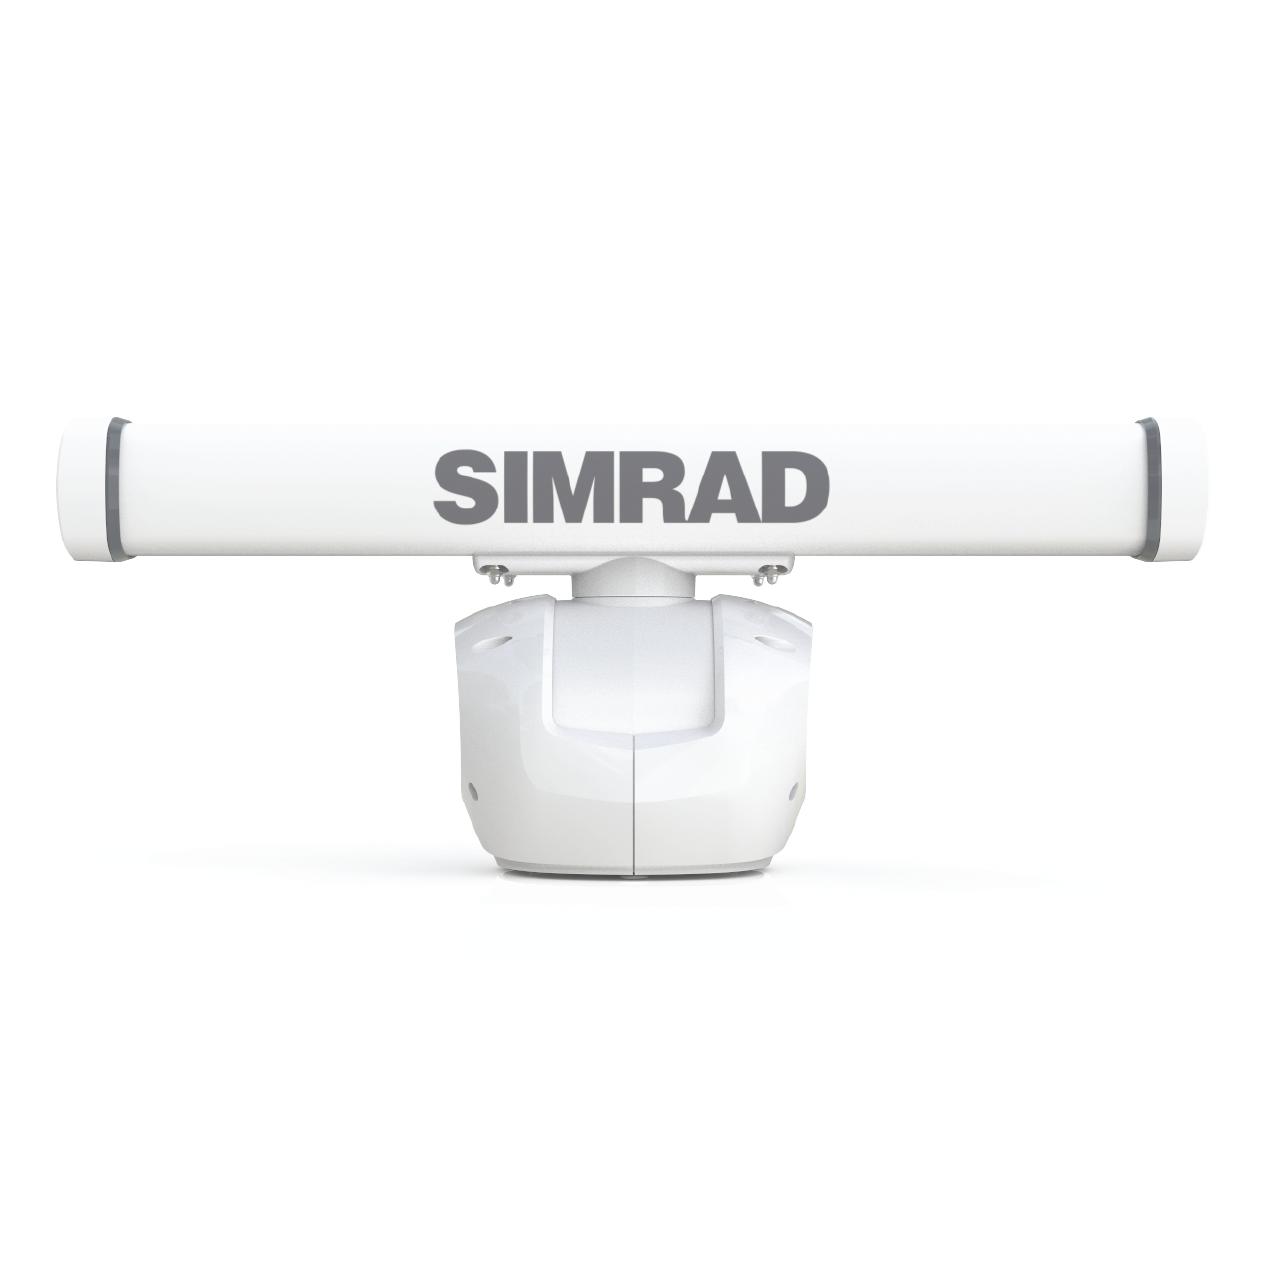 simrad halo 3 open array radar front view